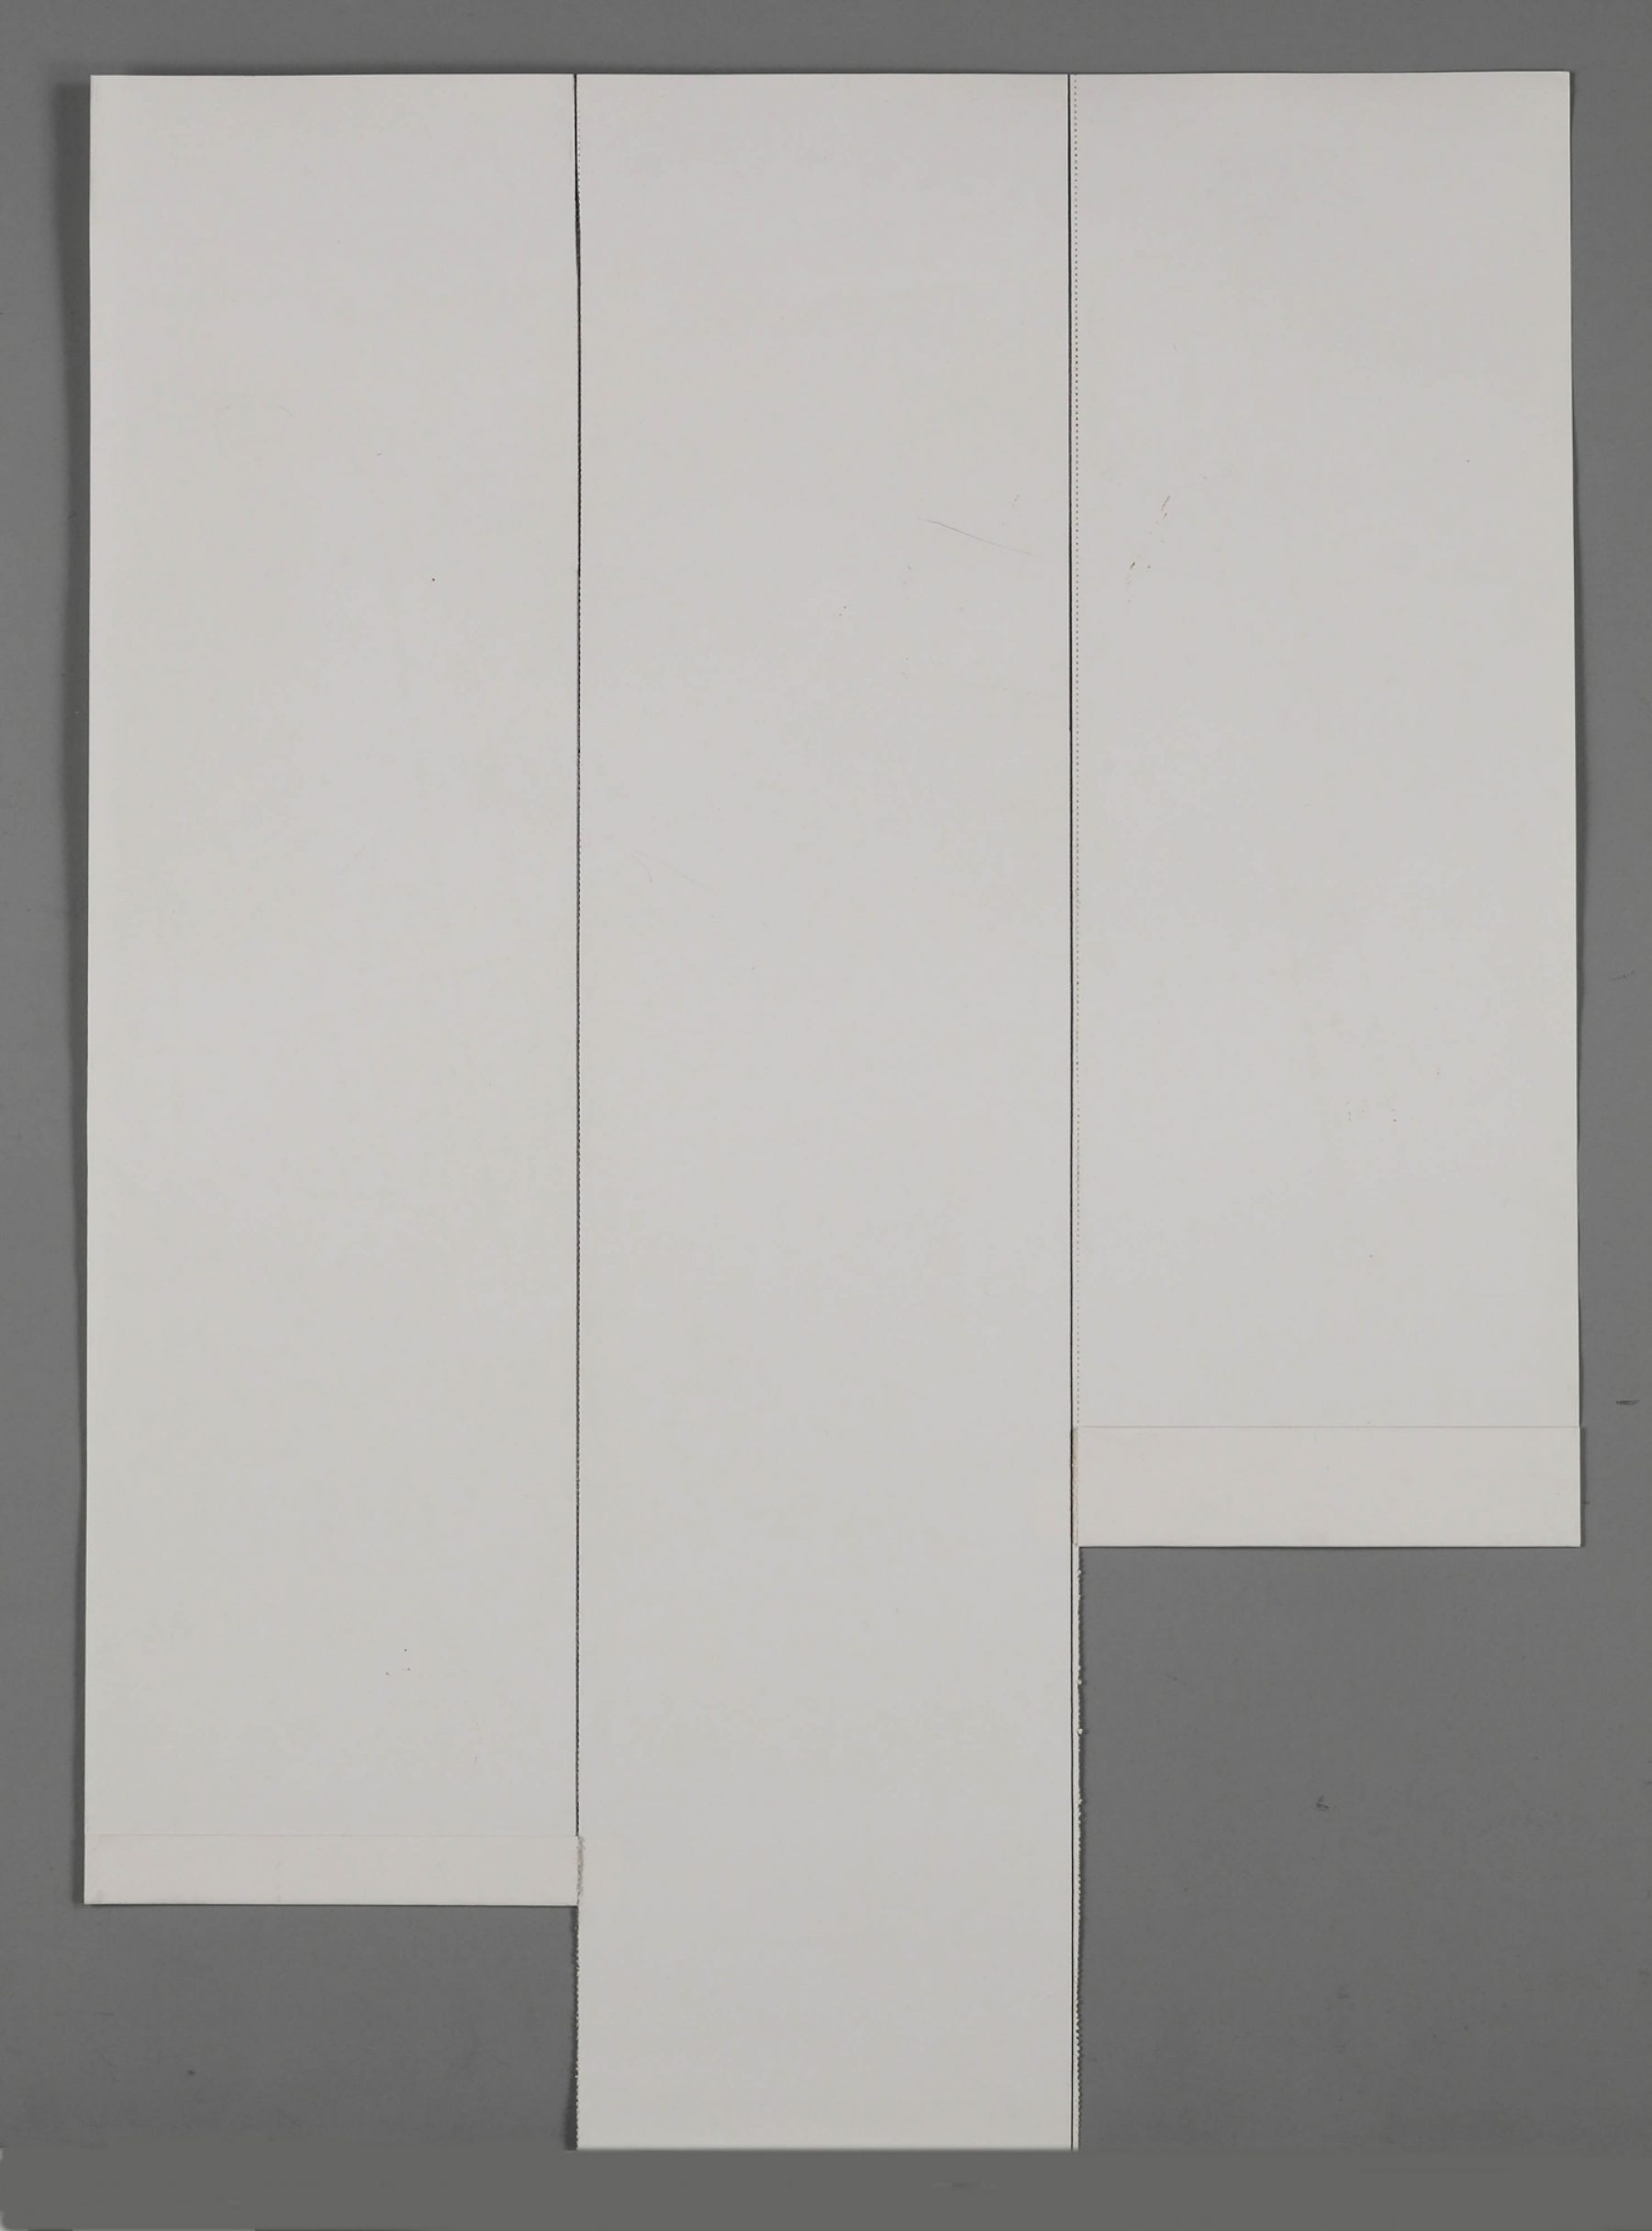 Divided Space (Babun)